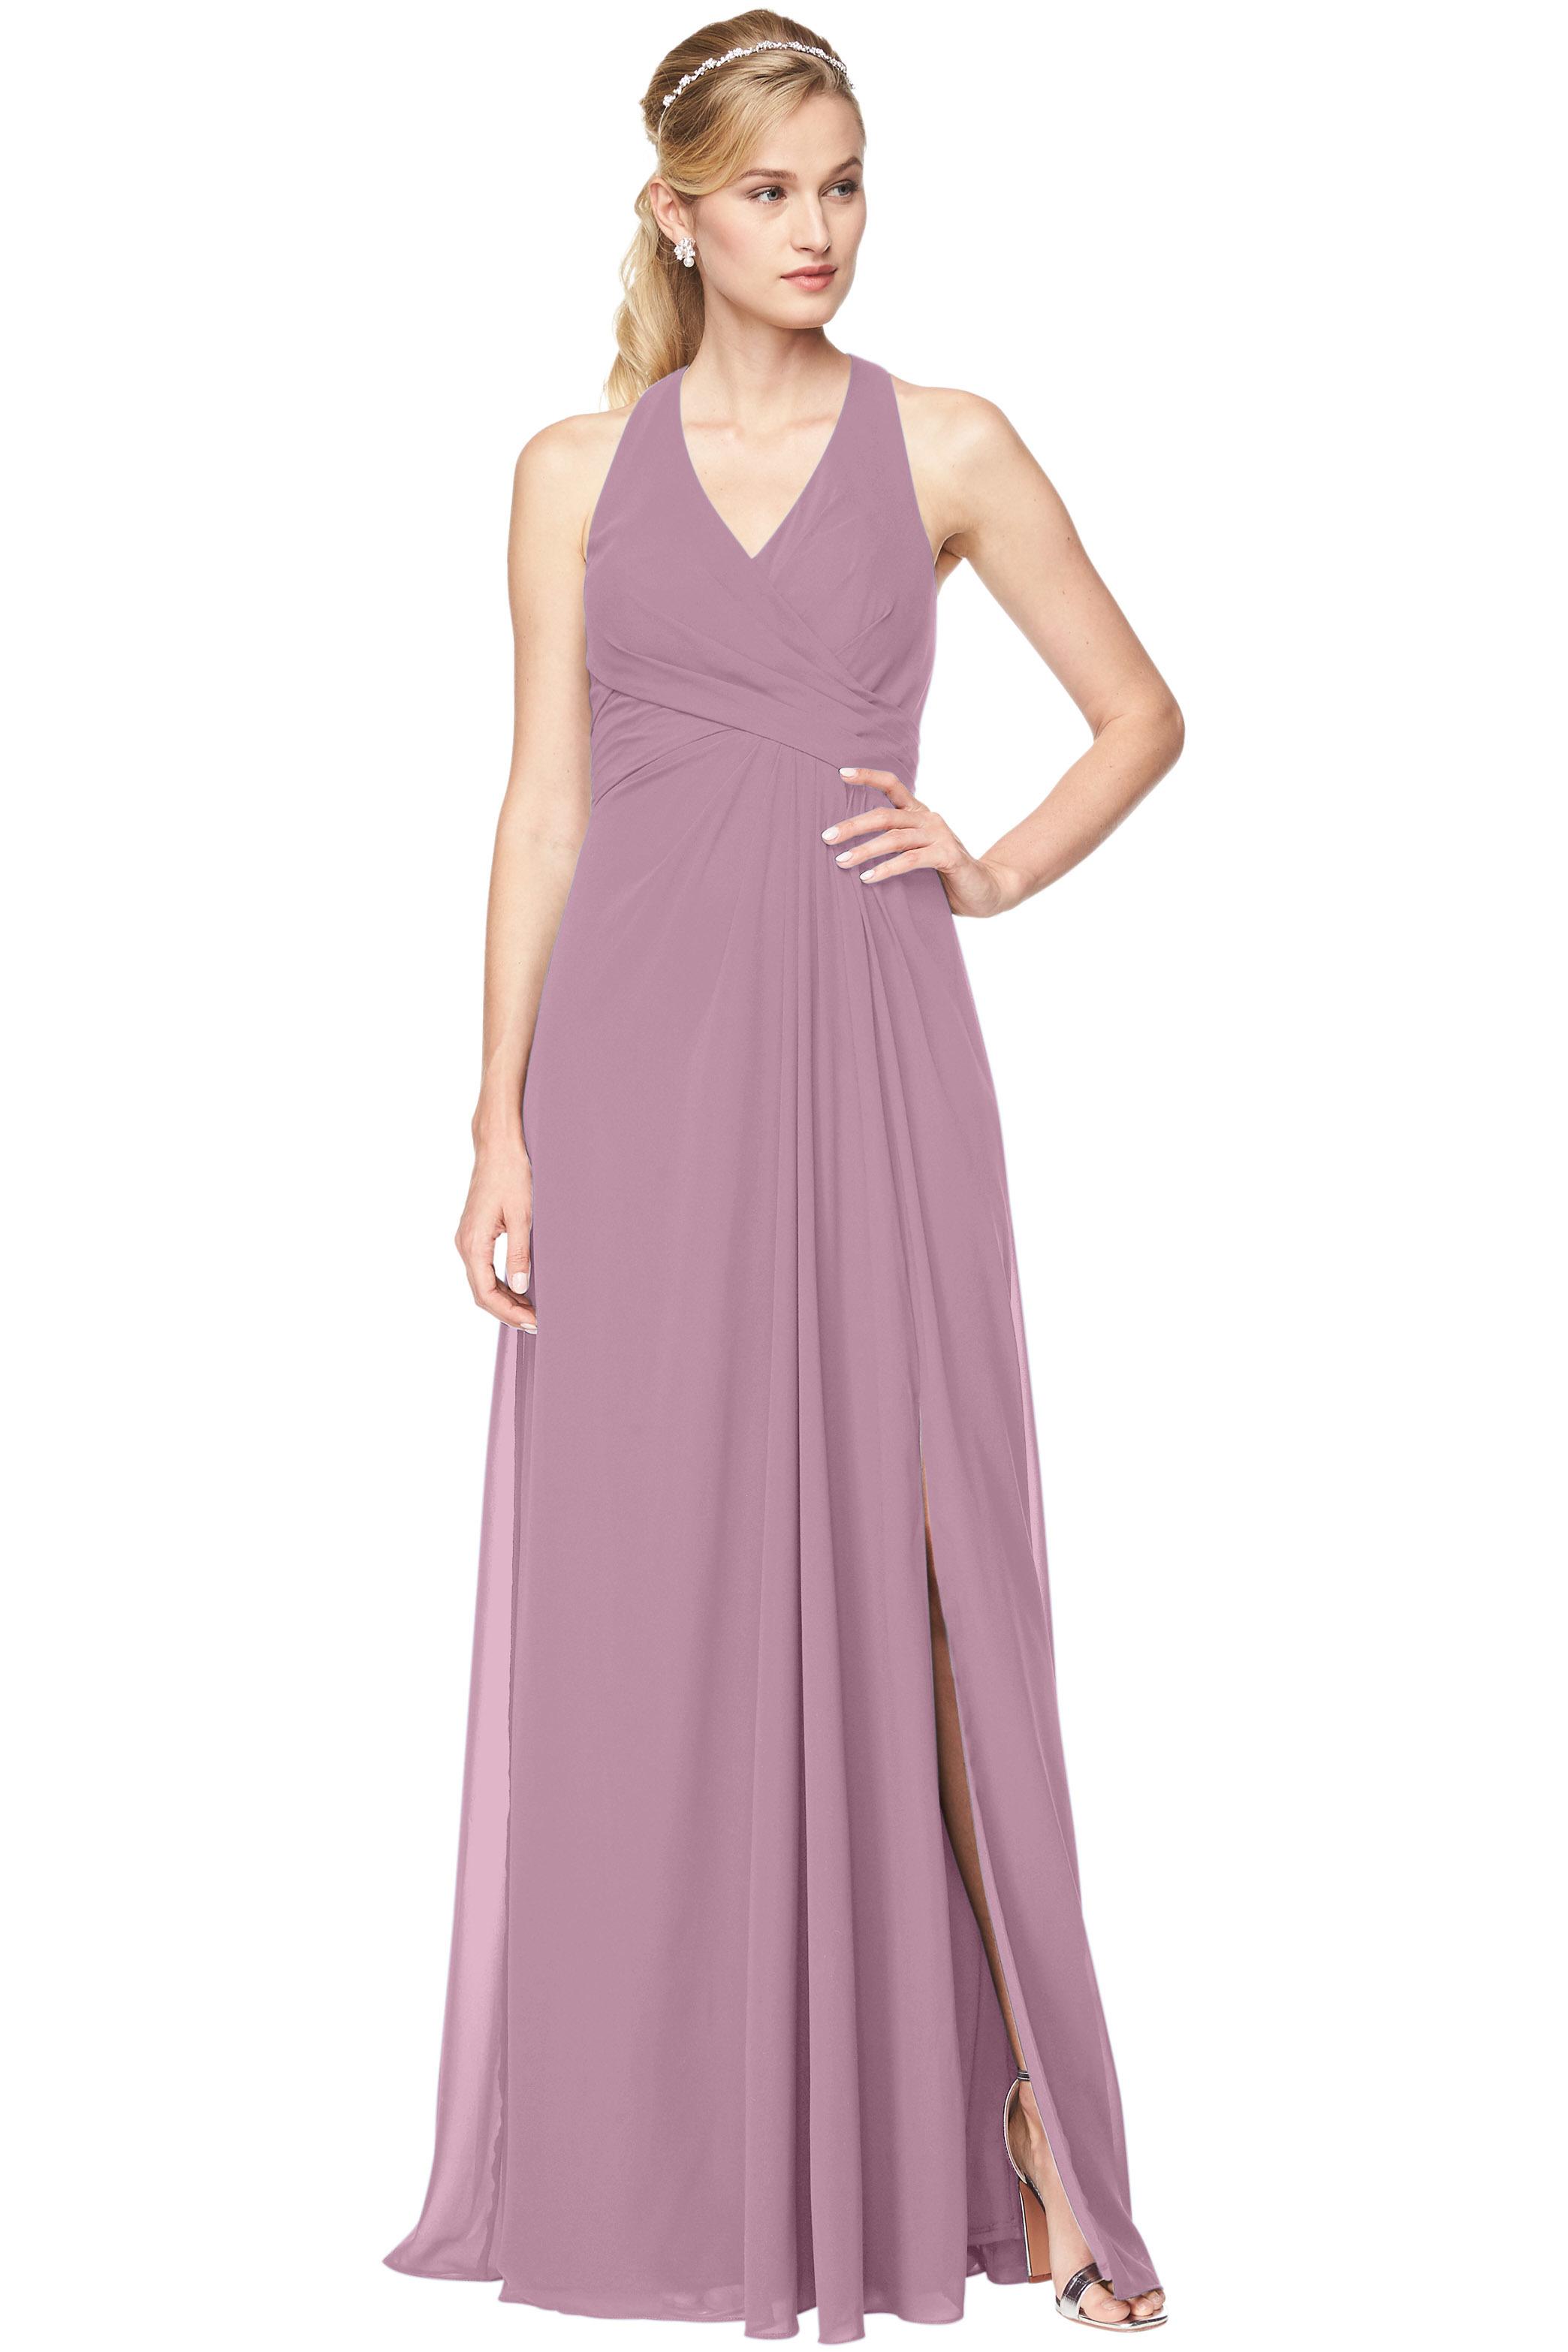 Bill Levkoff WISTERIA Chiffon V-Neck, Halter A-Line gown, $198.00 Front